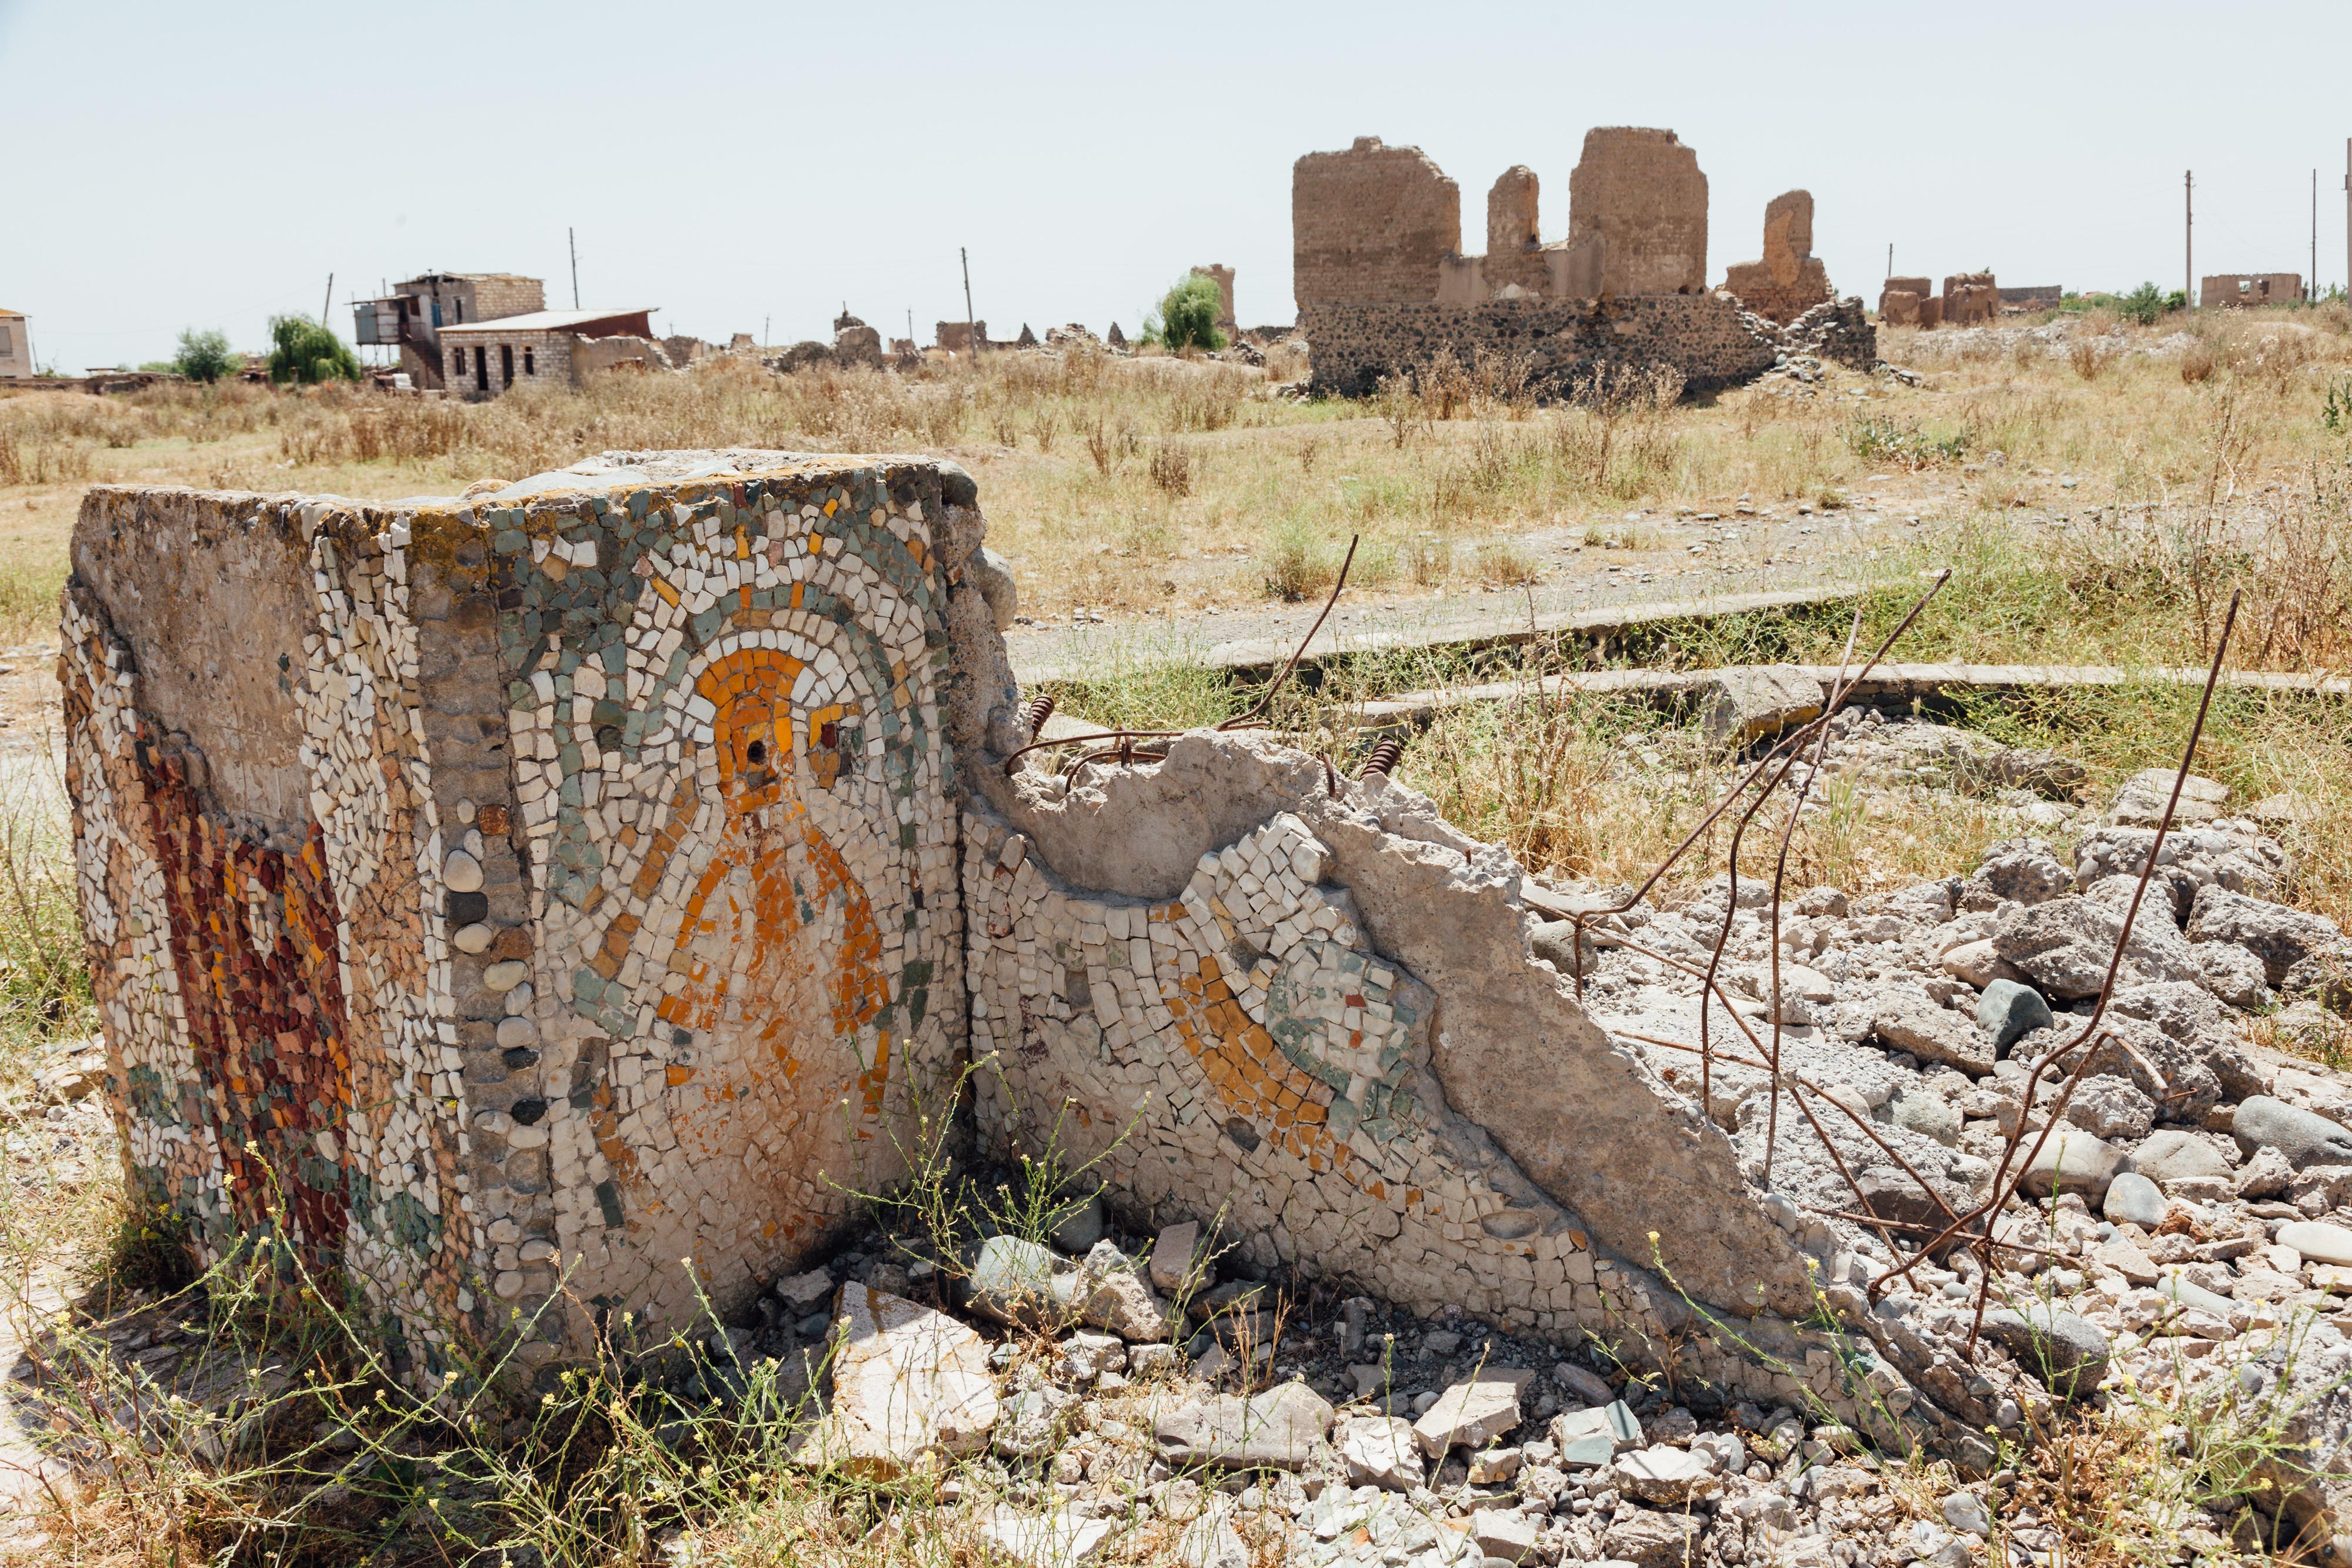 IMG_7060_Aserbaidschan_2010